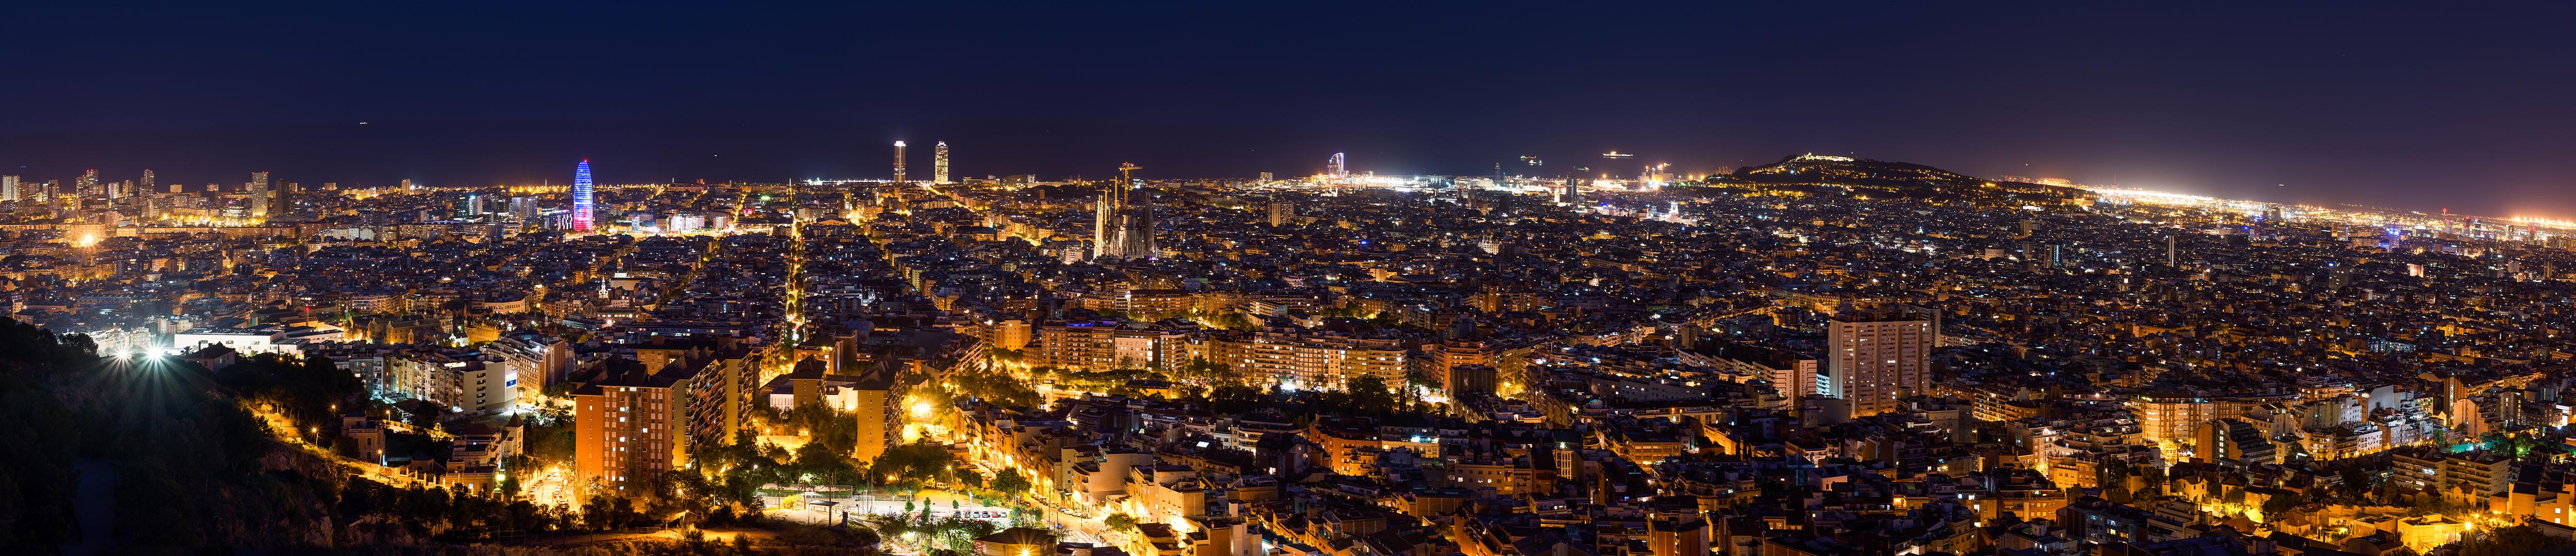 Barcelona en la noche